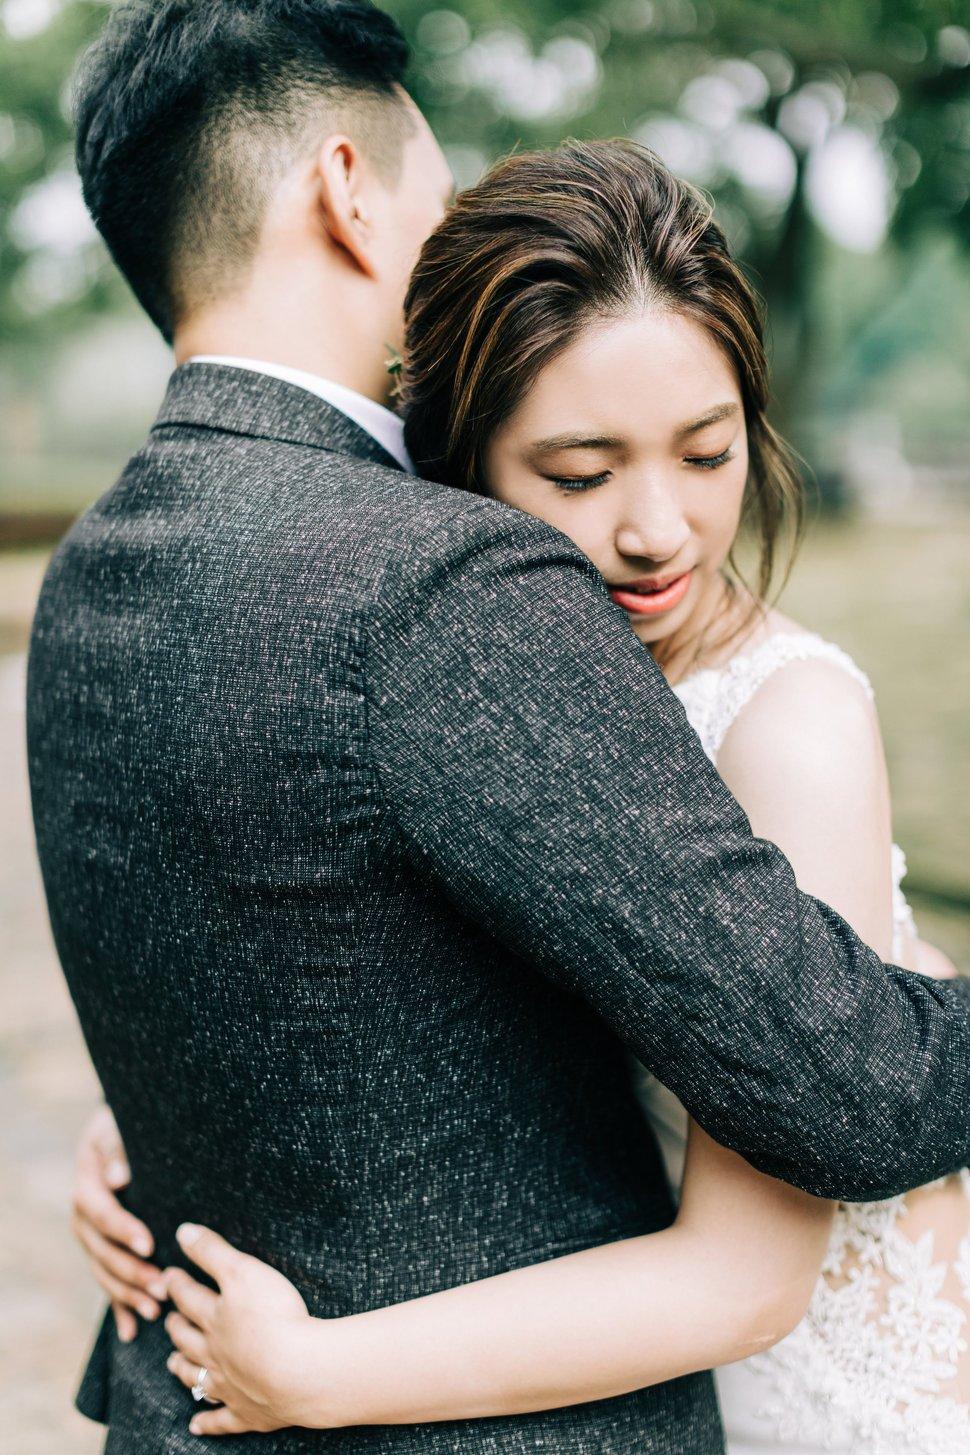 AG3_6708A - Cradle Wedding搖籃手工婚紗《結婚吧》